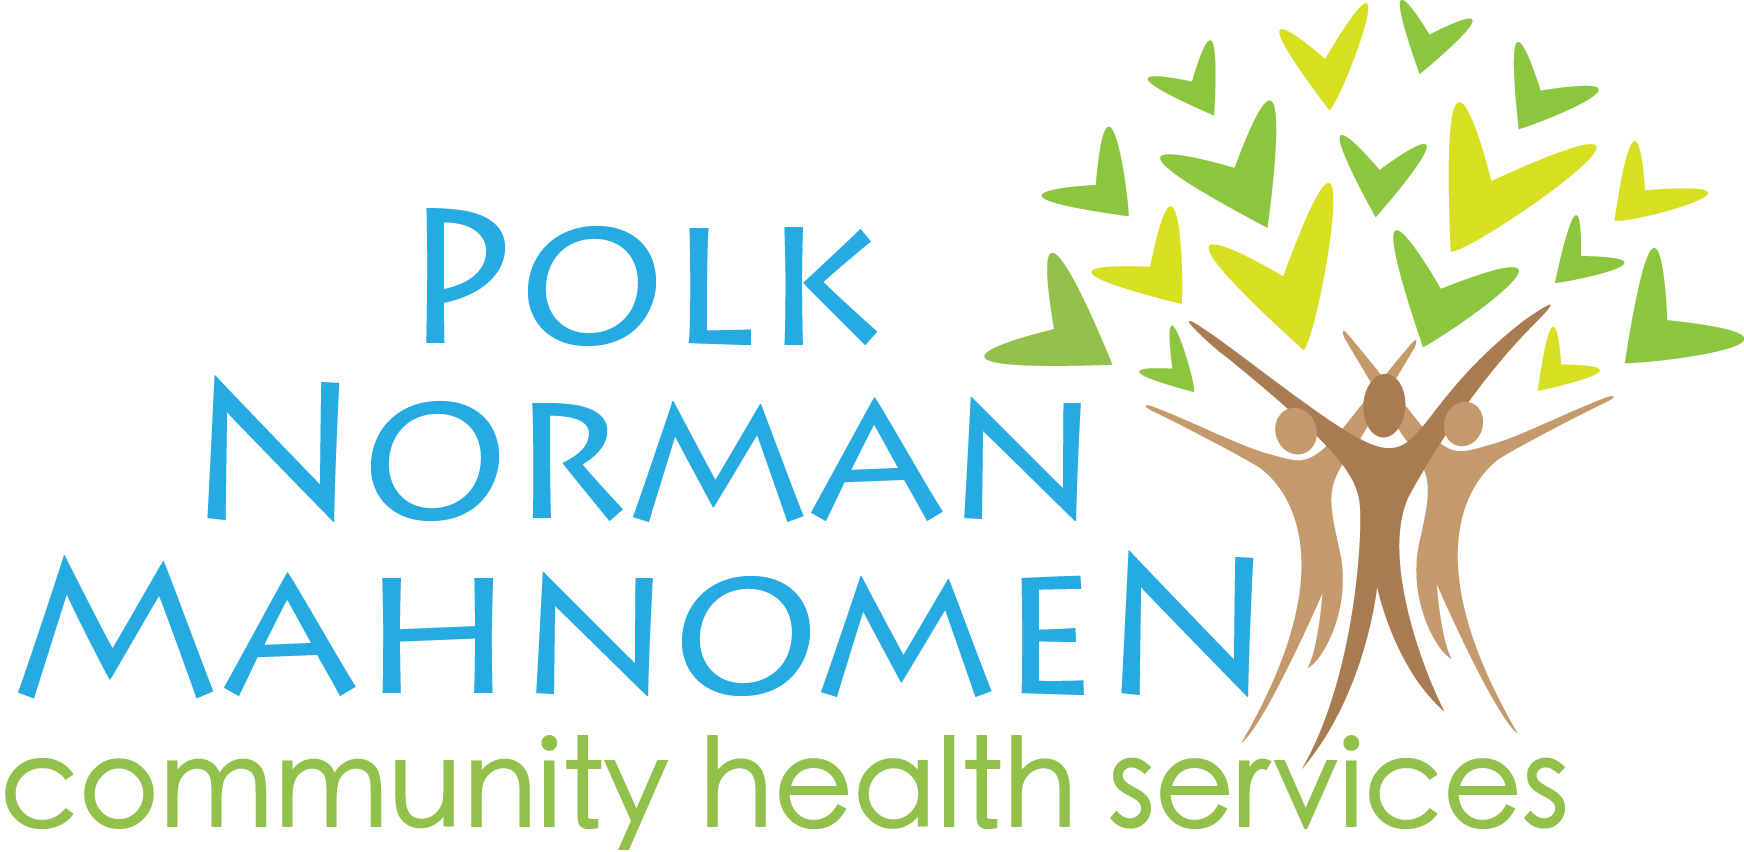 Polk-Norman-Mahnomen Community Health Board